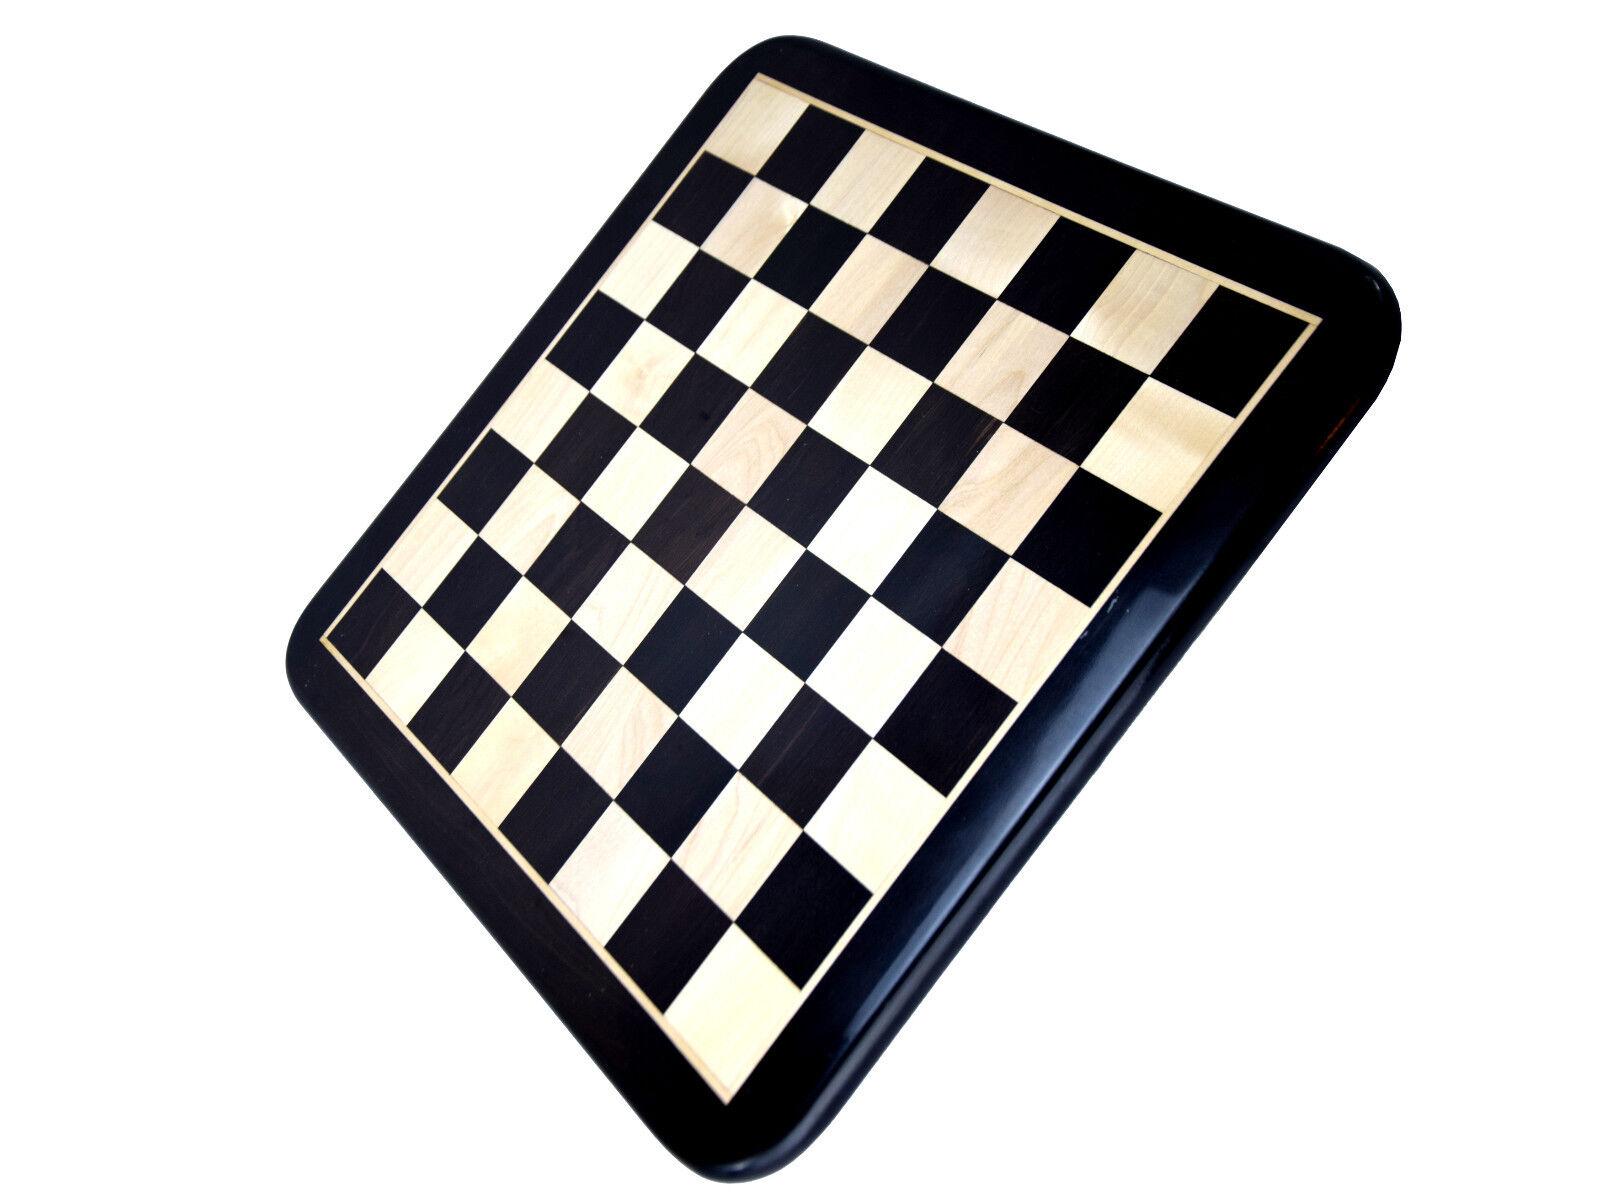 Minotaure Labyrinthe LUXE DAMIER 18  ébène Champ 47 mm angles arrondis Inde